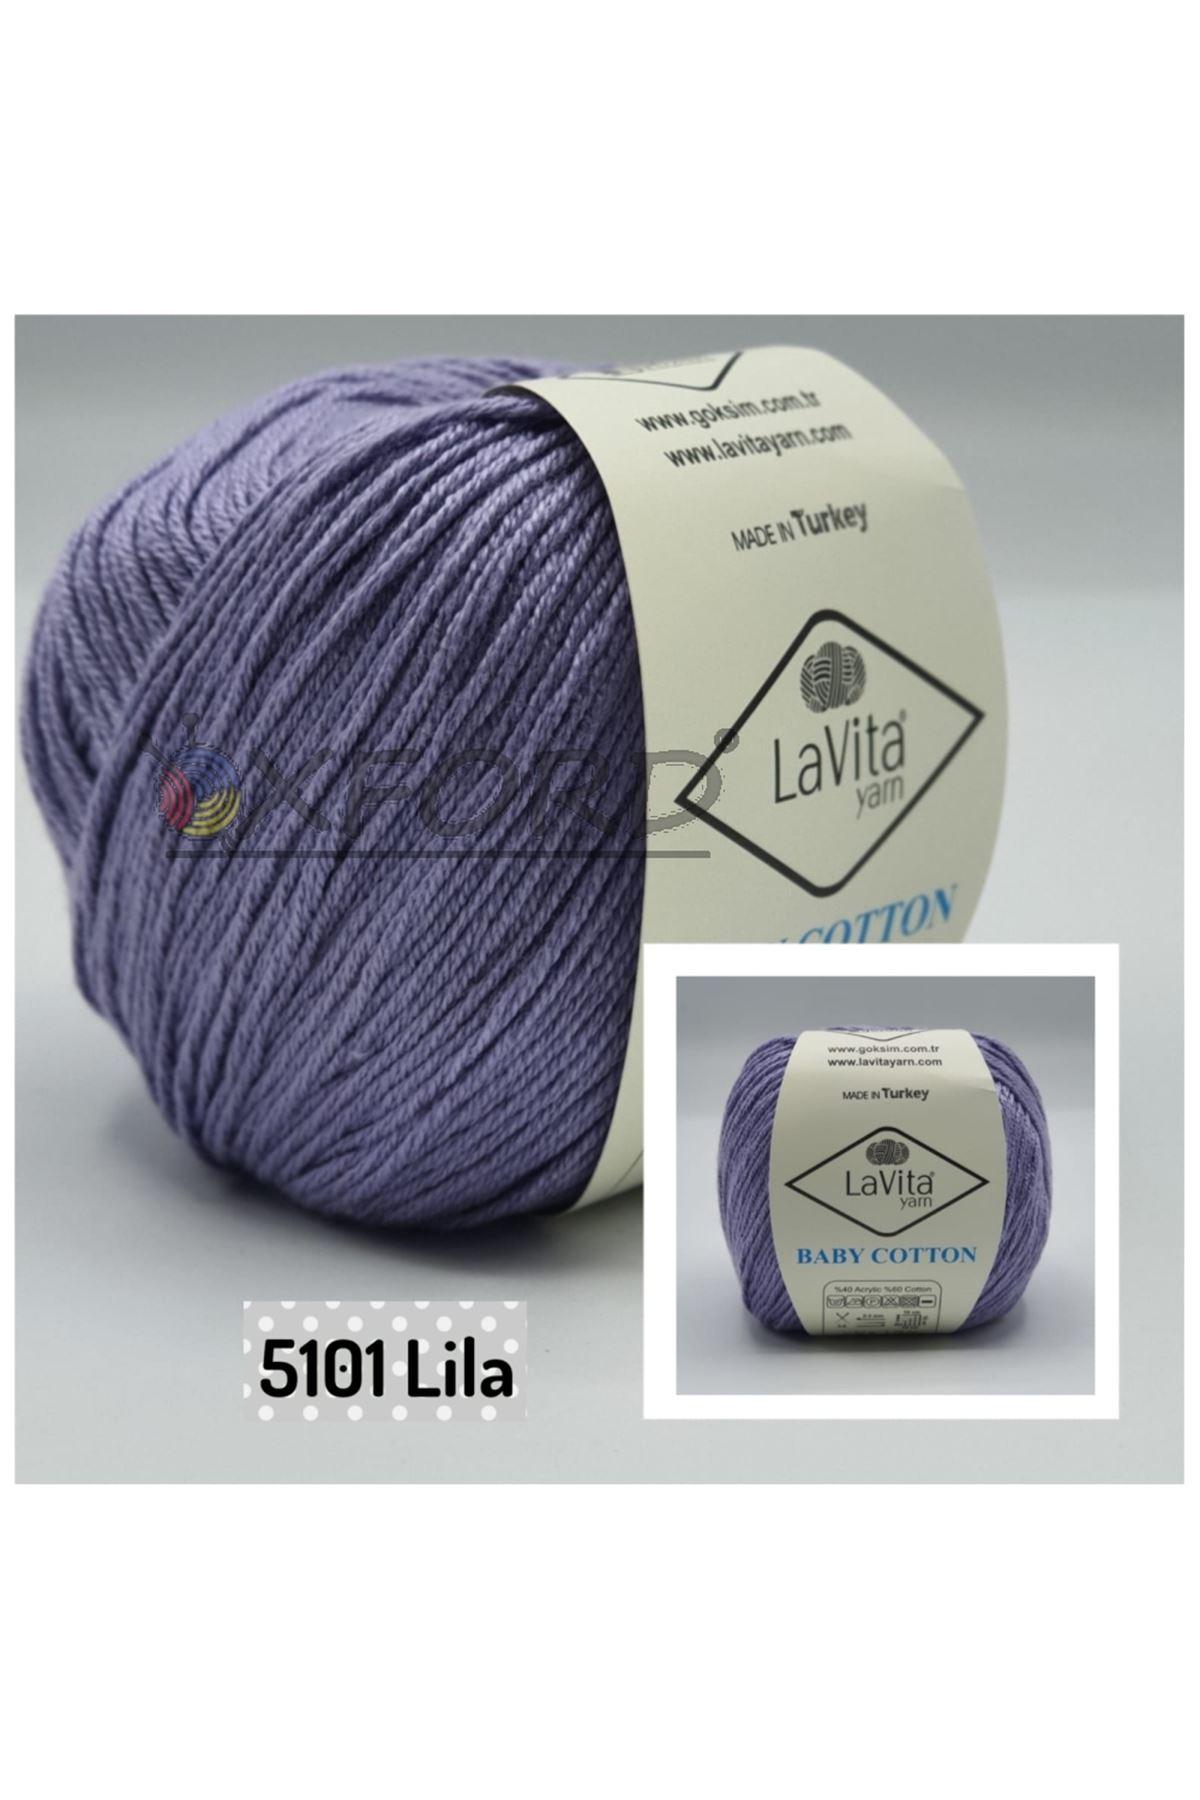 Lavita Baby Cotton 5101 Lila